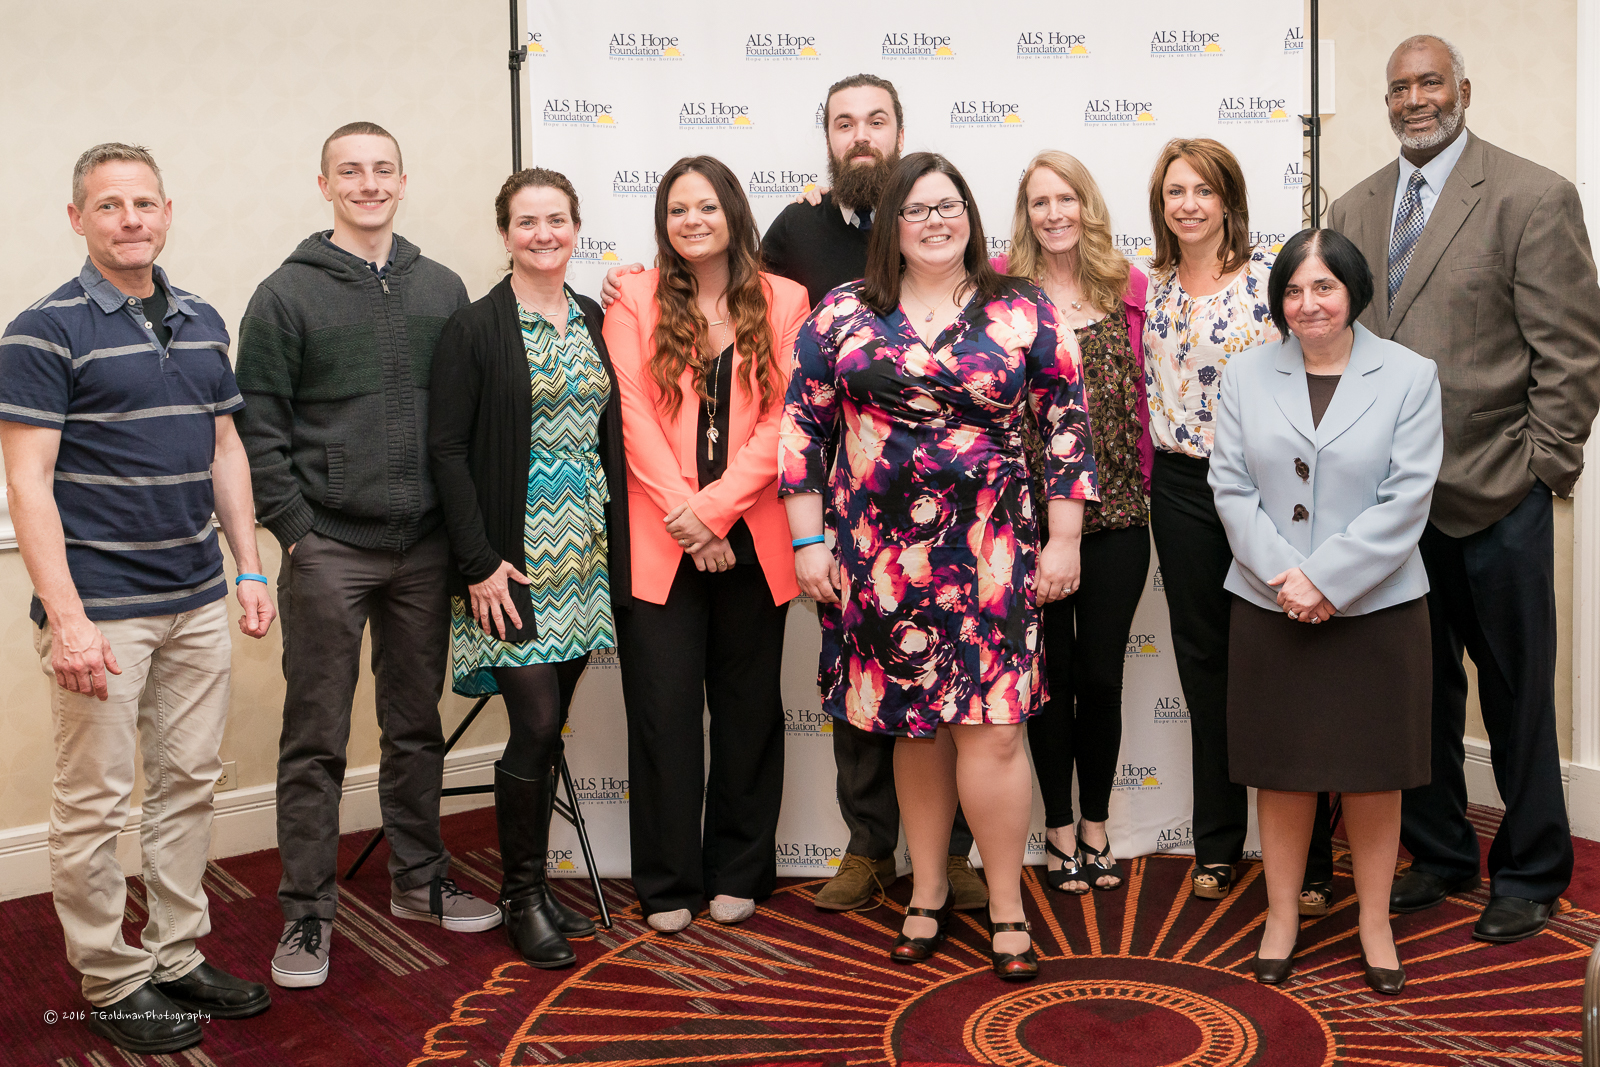 ALS Hope Foundation Annual Meeting 2016-12.jpg